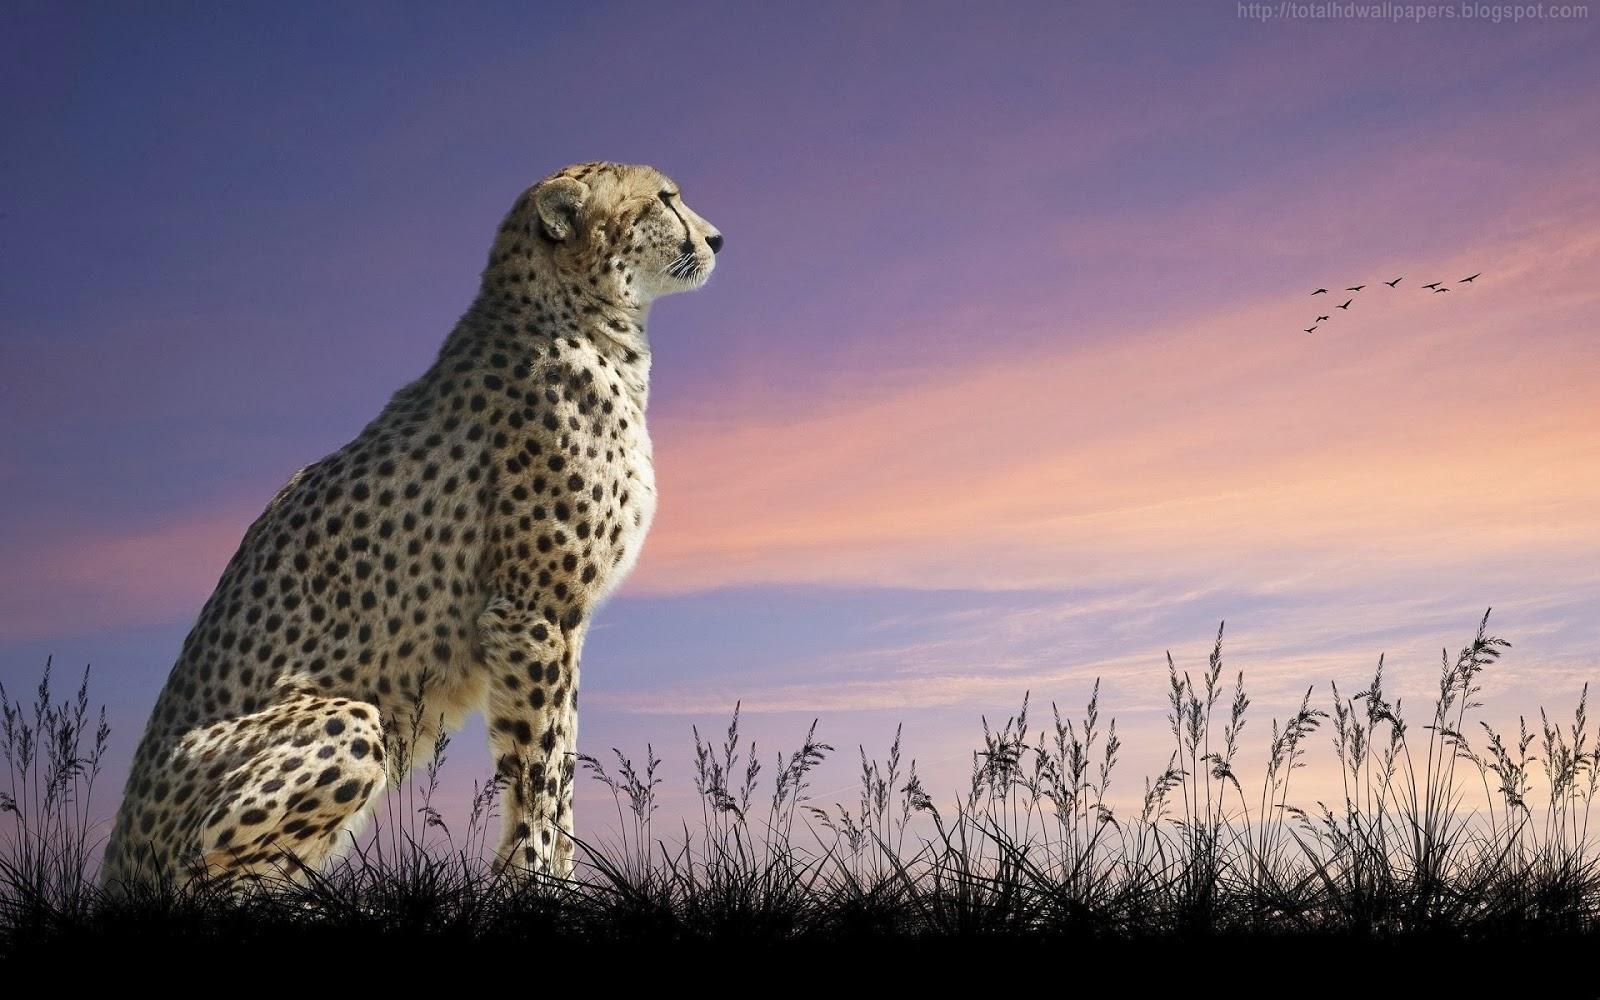 Beautiful Desktop HD Wallpapers 1080p: Cheetah HD Wallpapers Wallpapers Pc